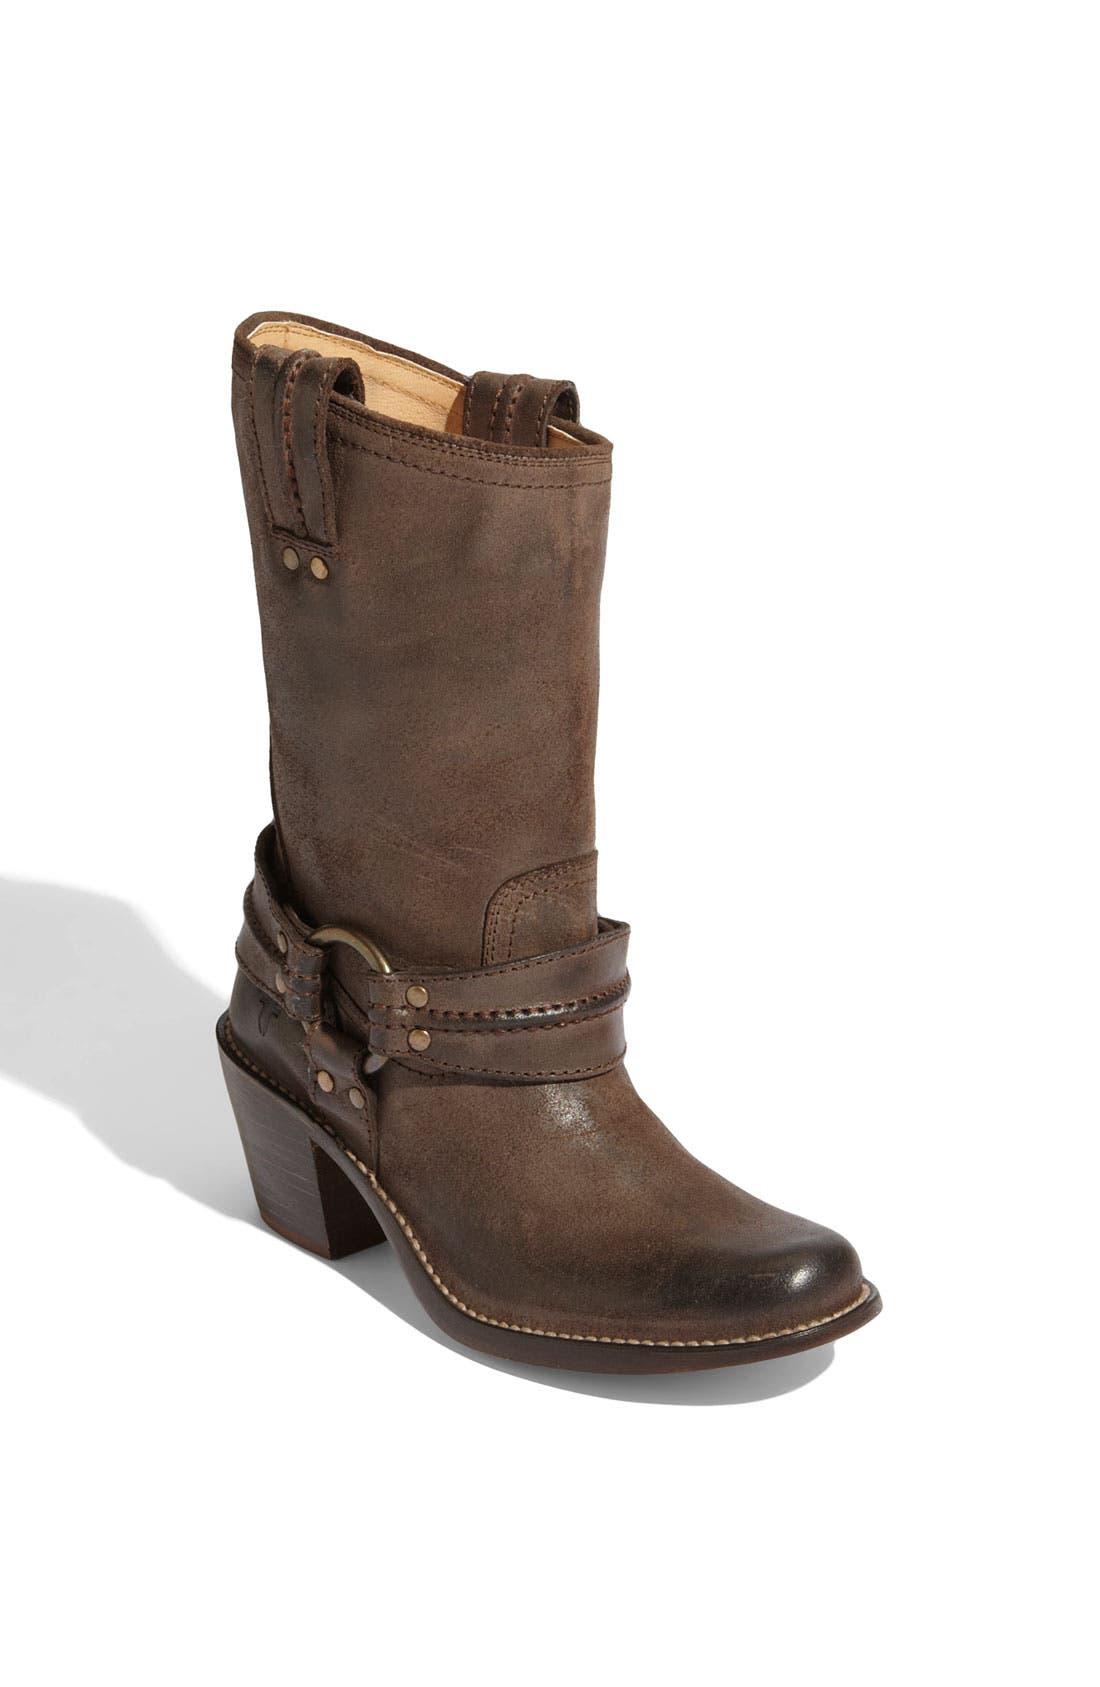 Alternate Image 1 Selected - Frye 'Carmen' Harness Short Boot